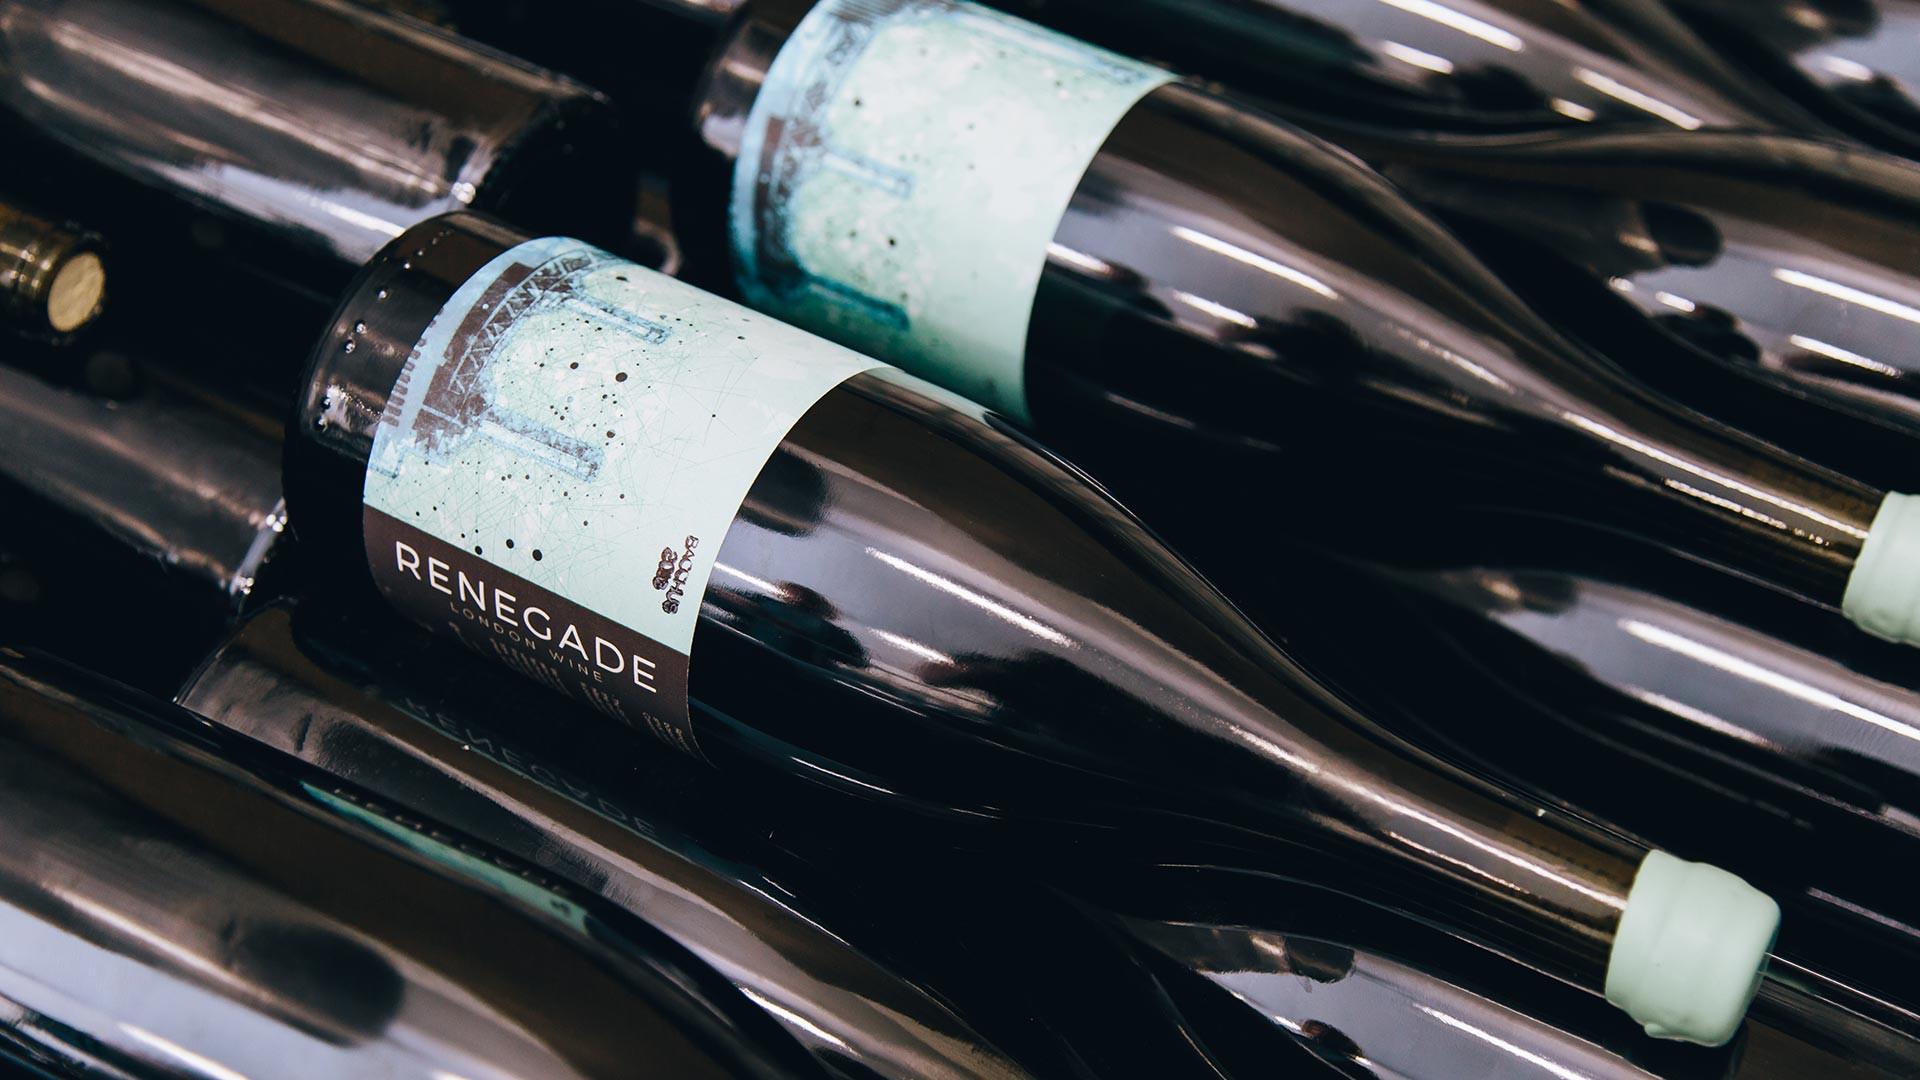 BACCHUS Renegade London wine